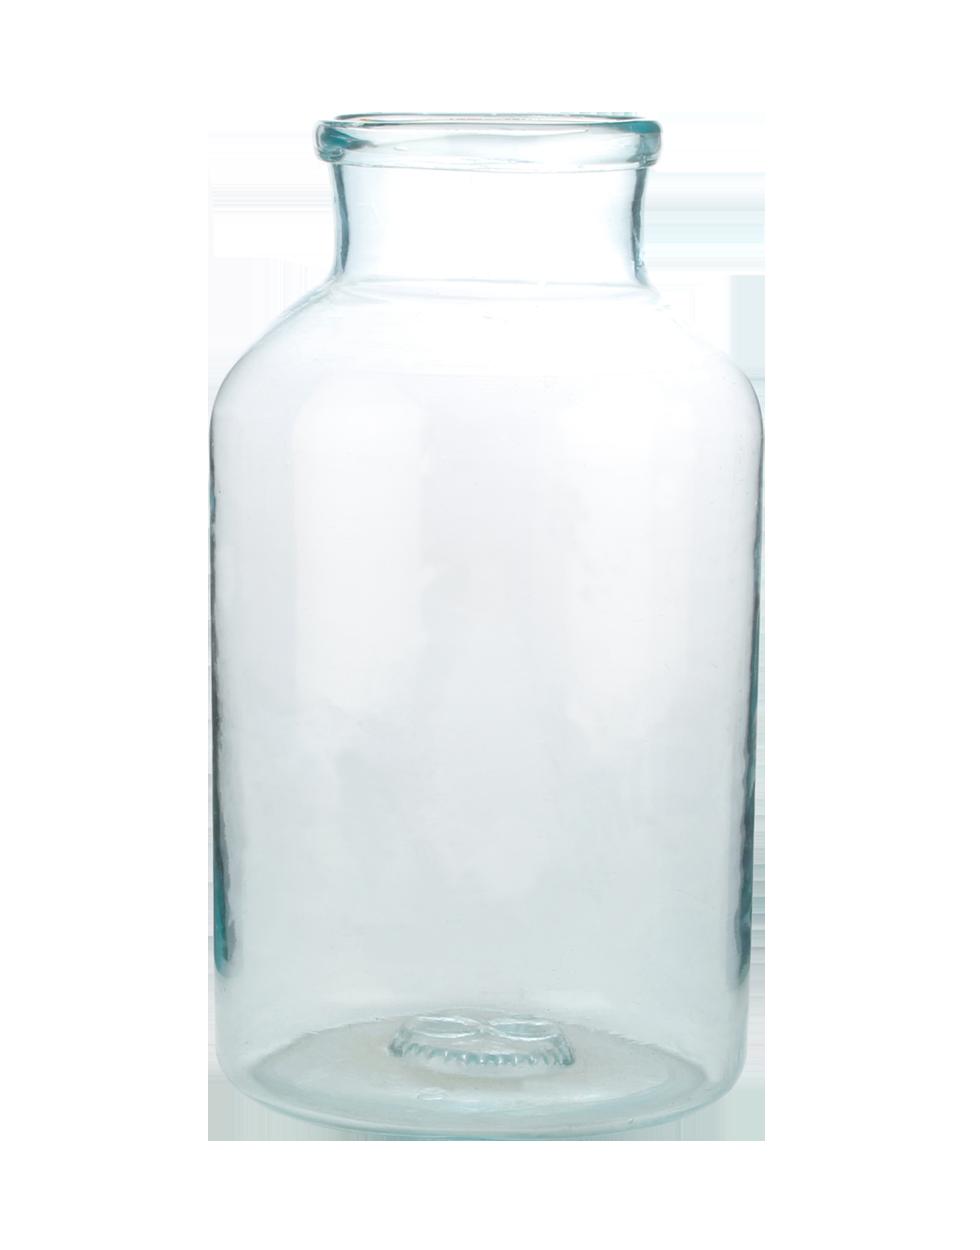 Hungarian Canning Jar Large Rentals Bright Rentals